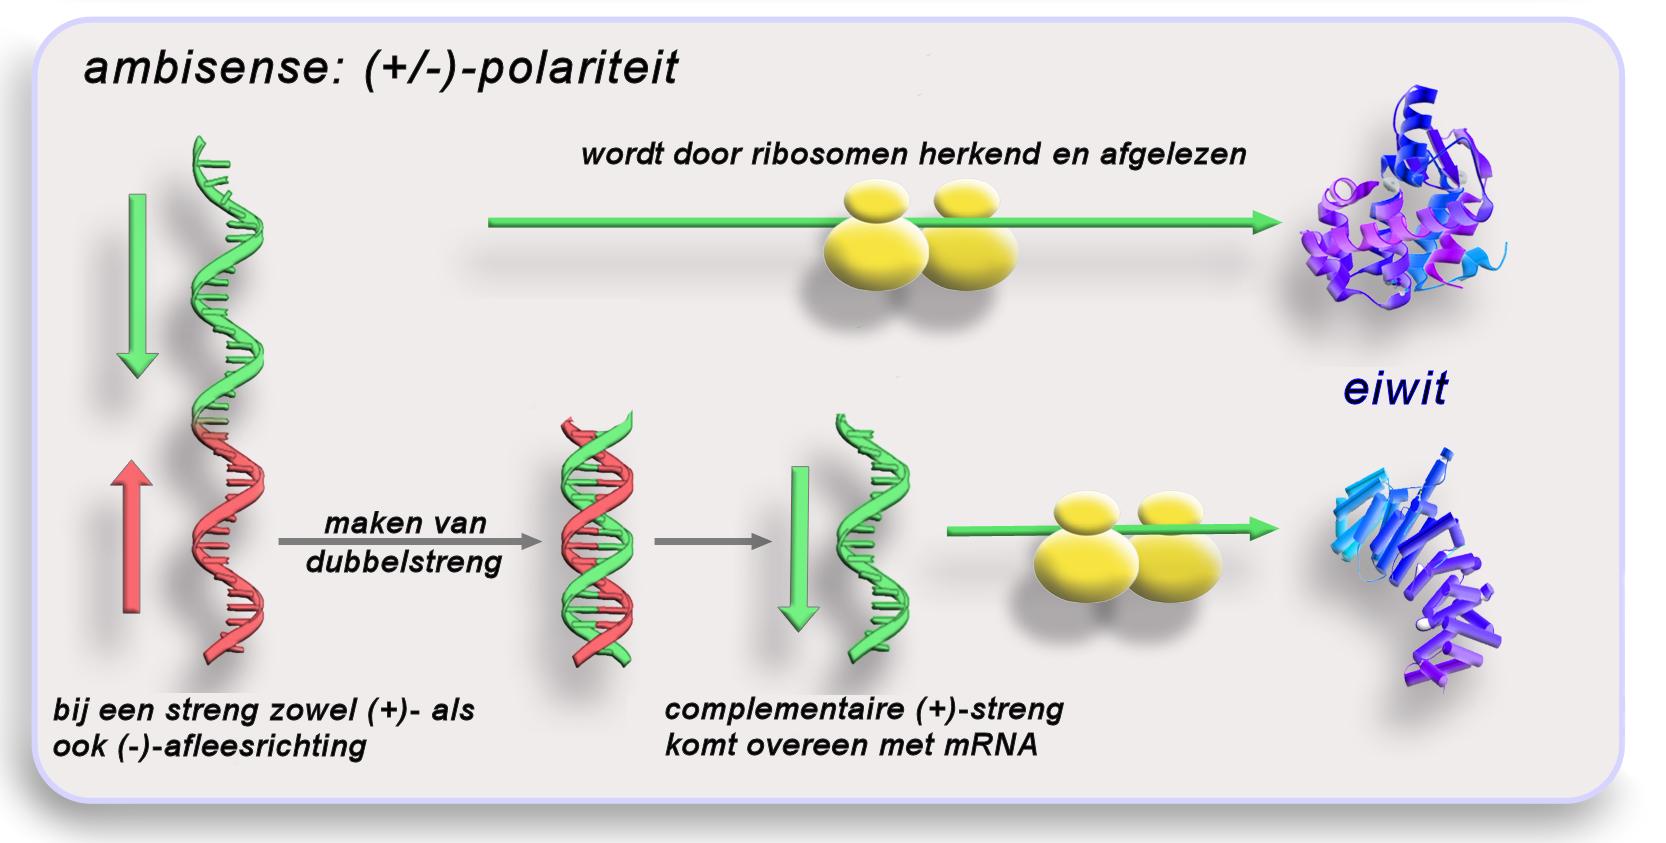 Polaritaet ambisense nl.png